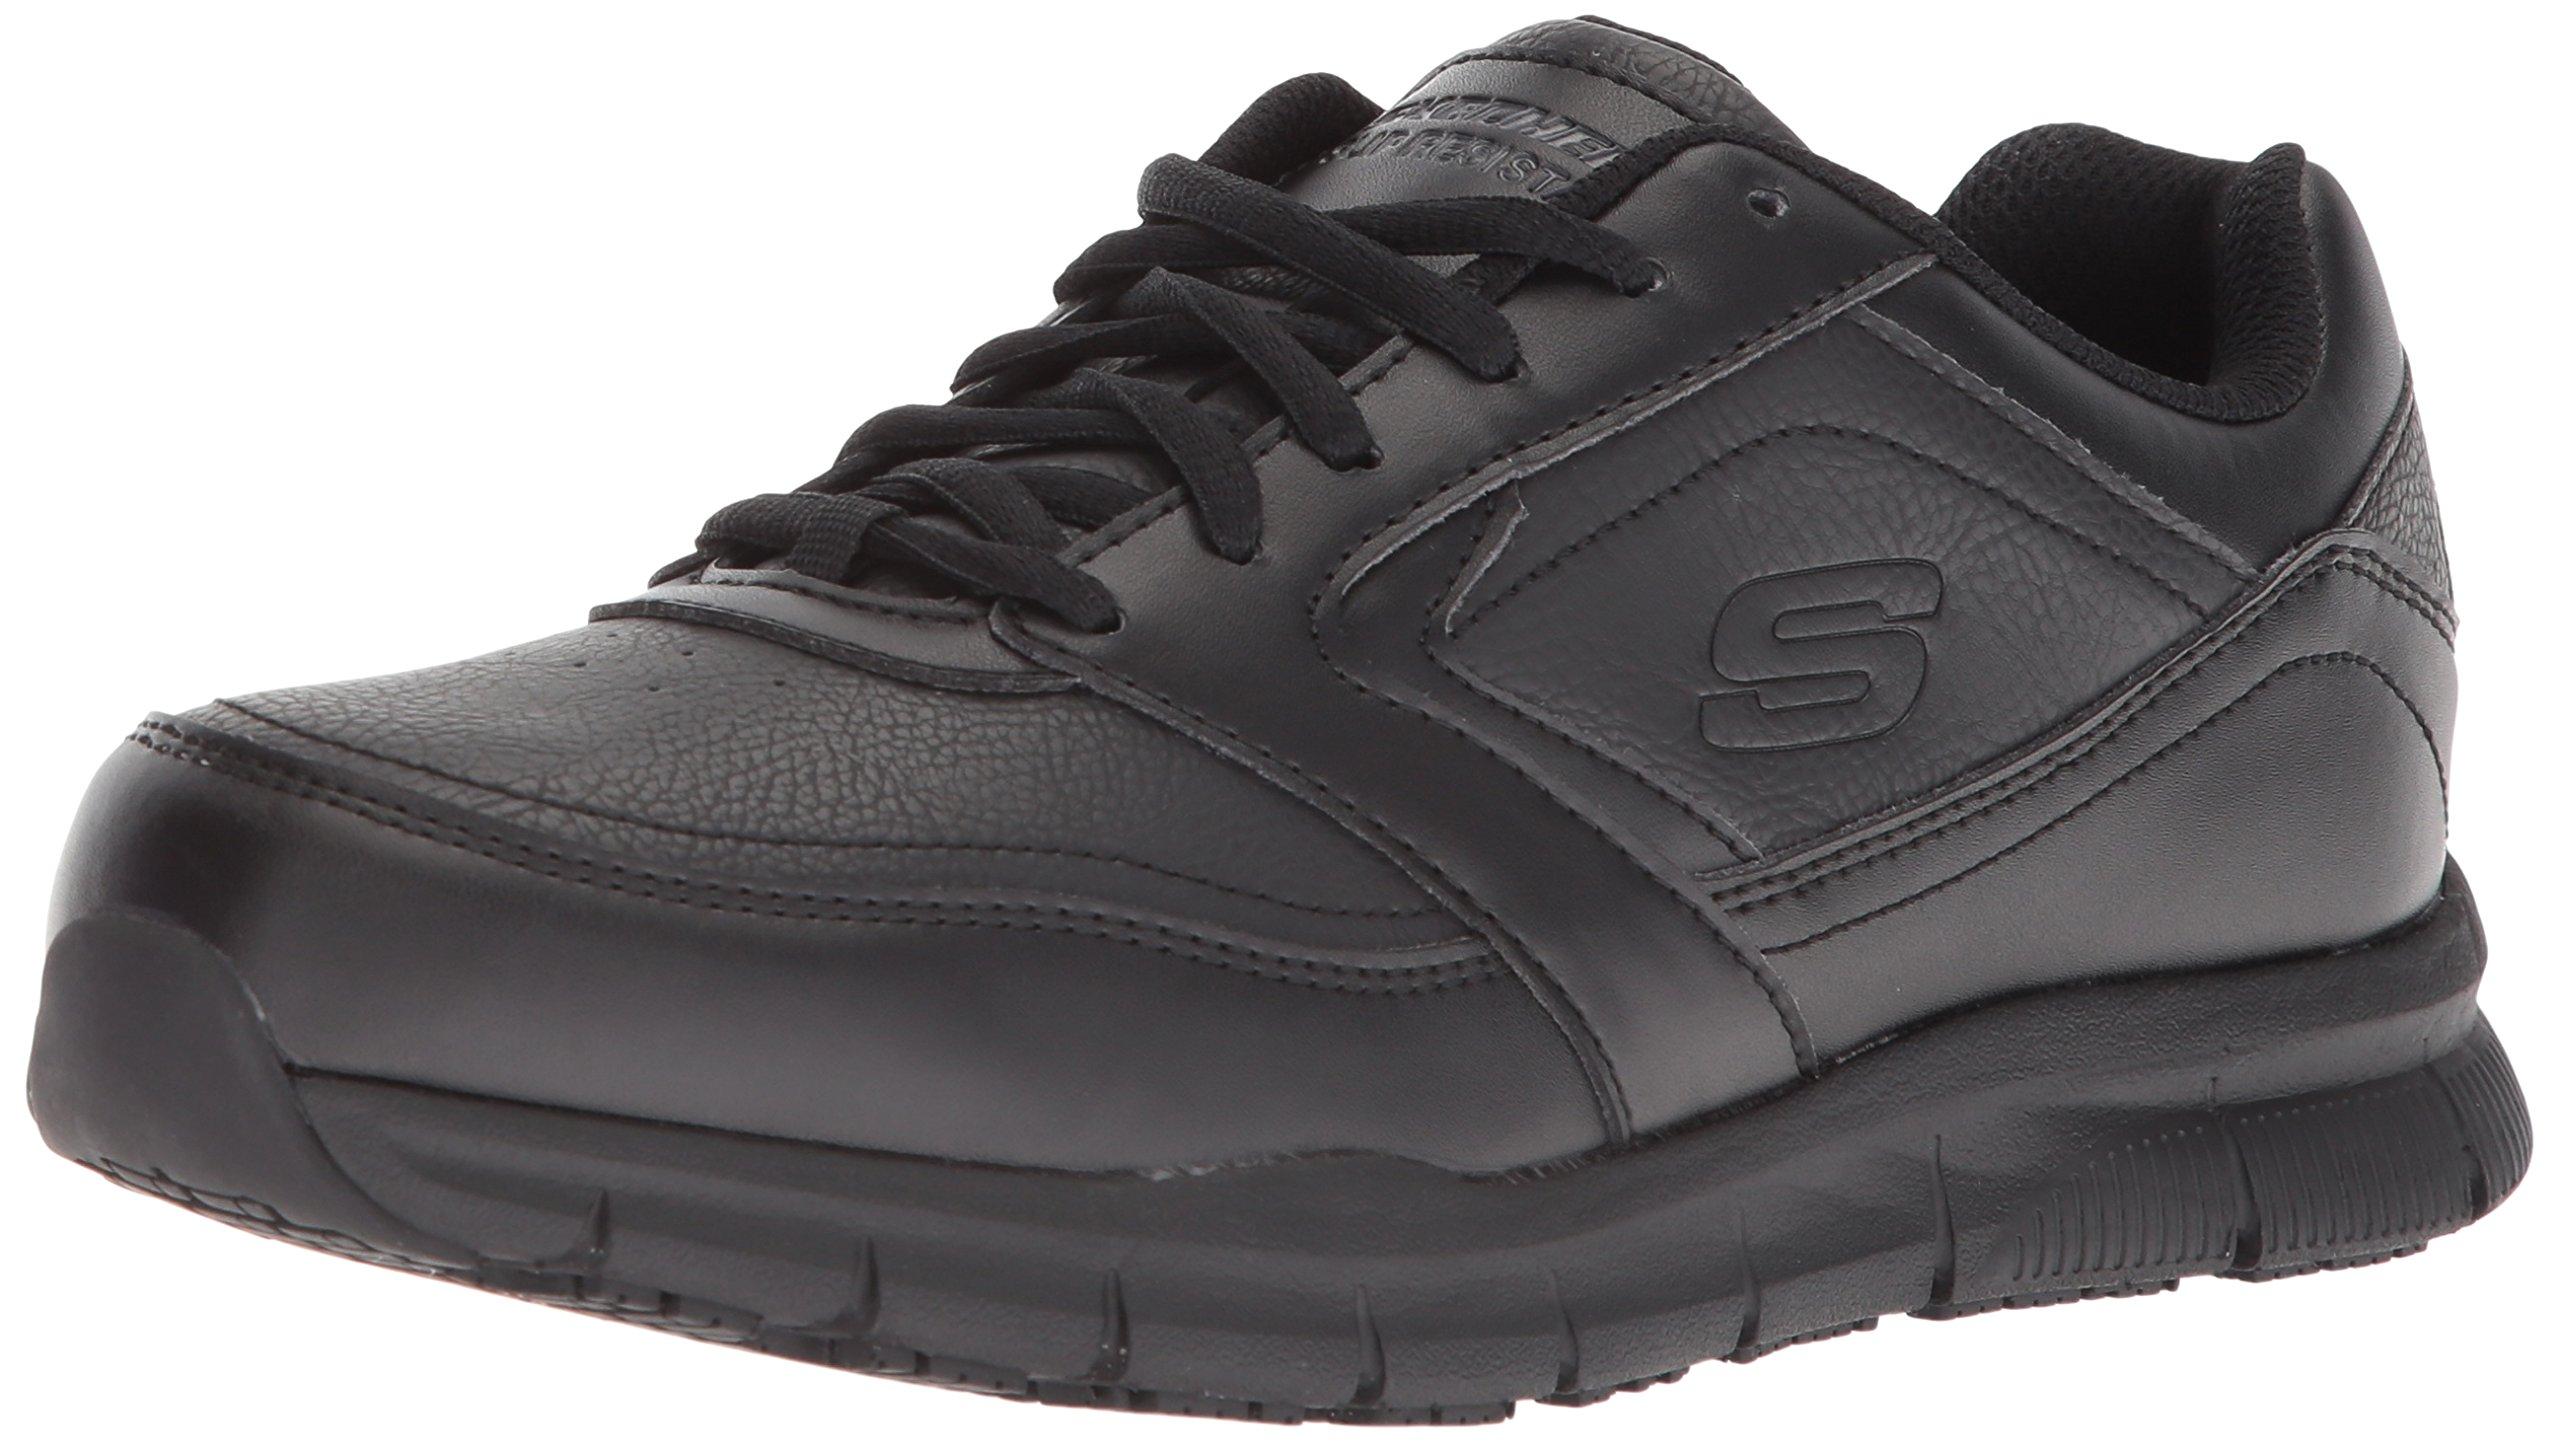 Skechers for Work Women's Nampa-Wyola Food Service Shoe, Black Polyurethane, 8 W US